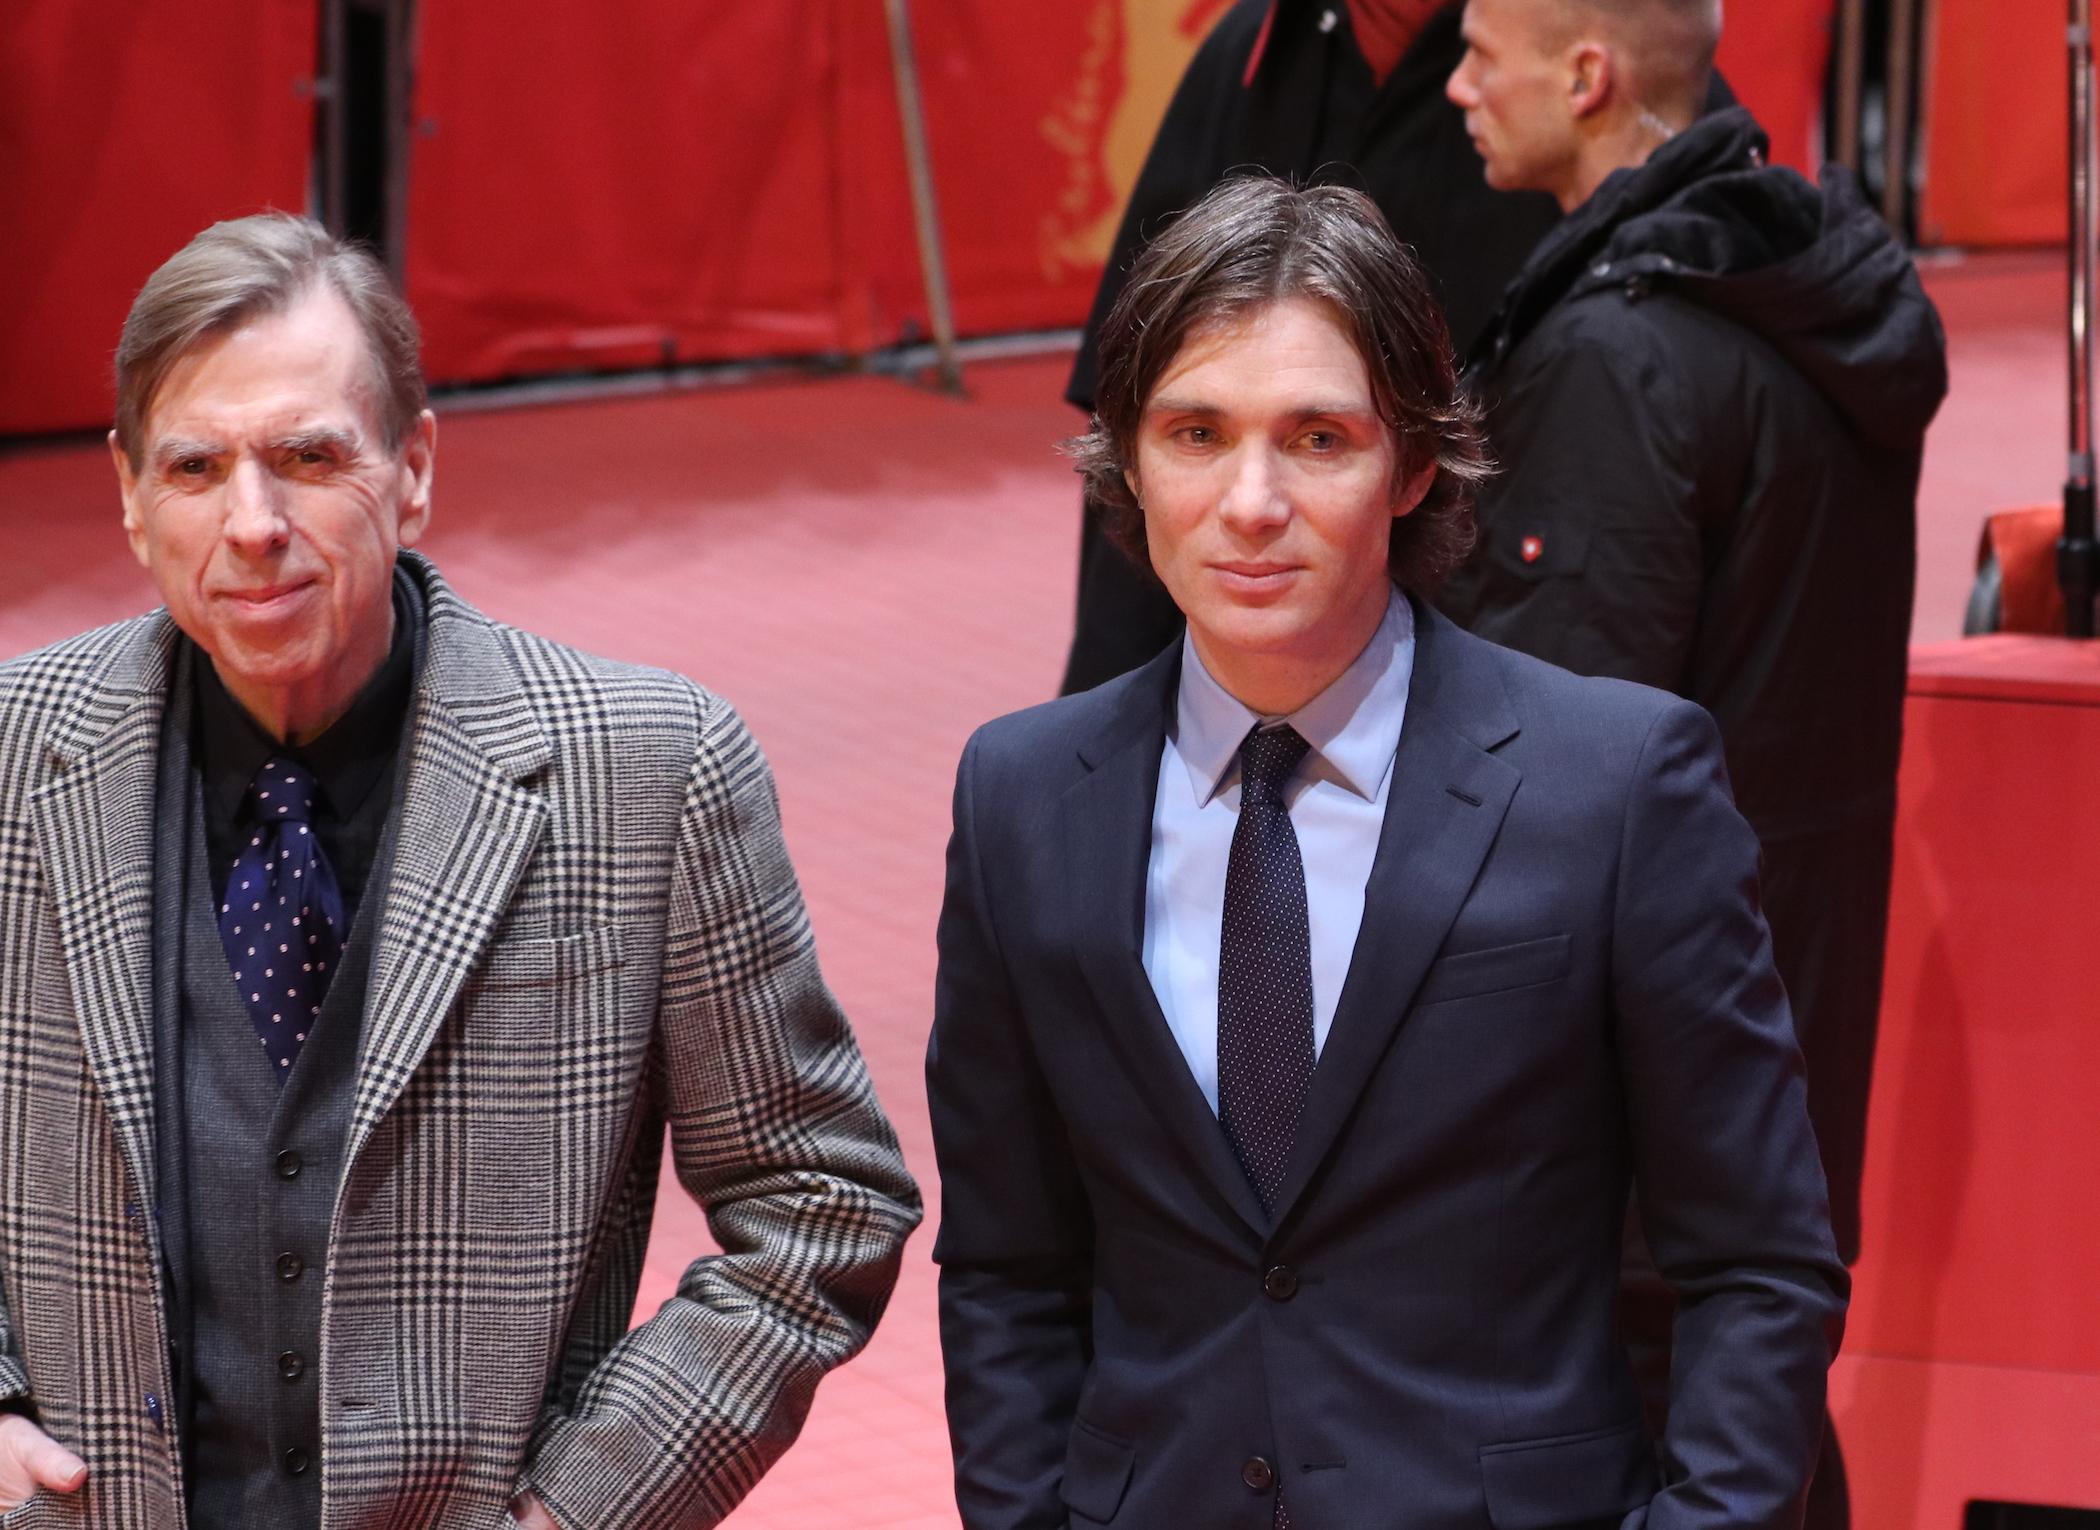 Berlino 2017: Cillian Murphy e Timothy Spall sul red carpet di The party